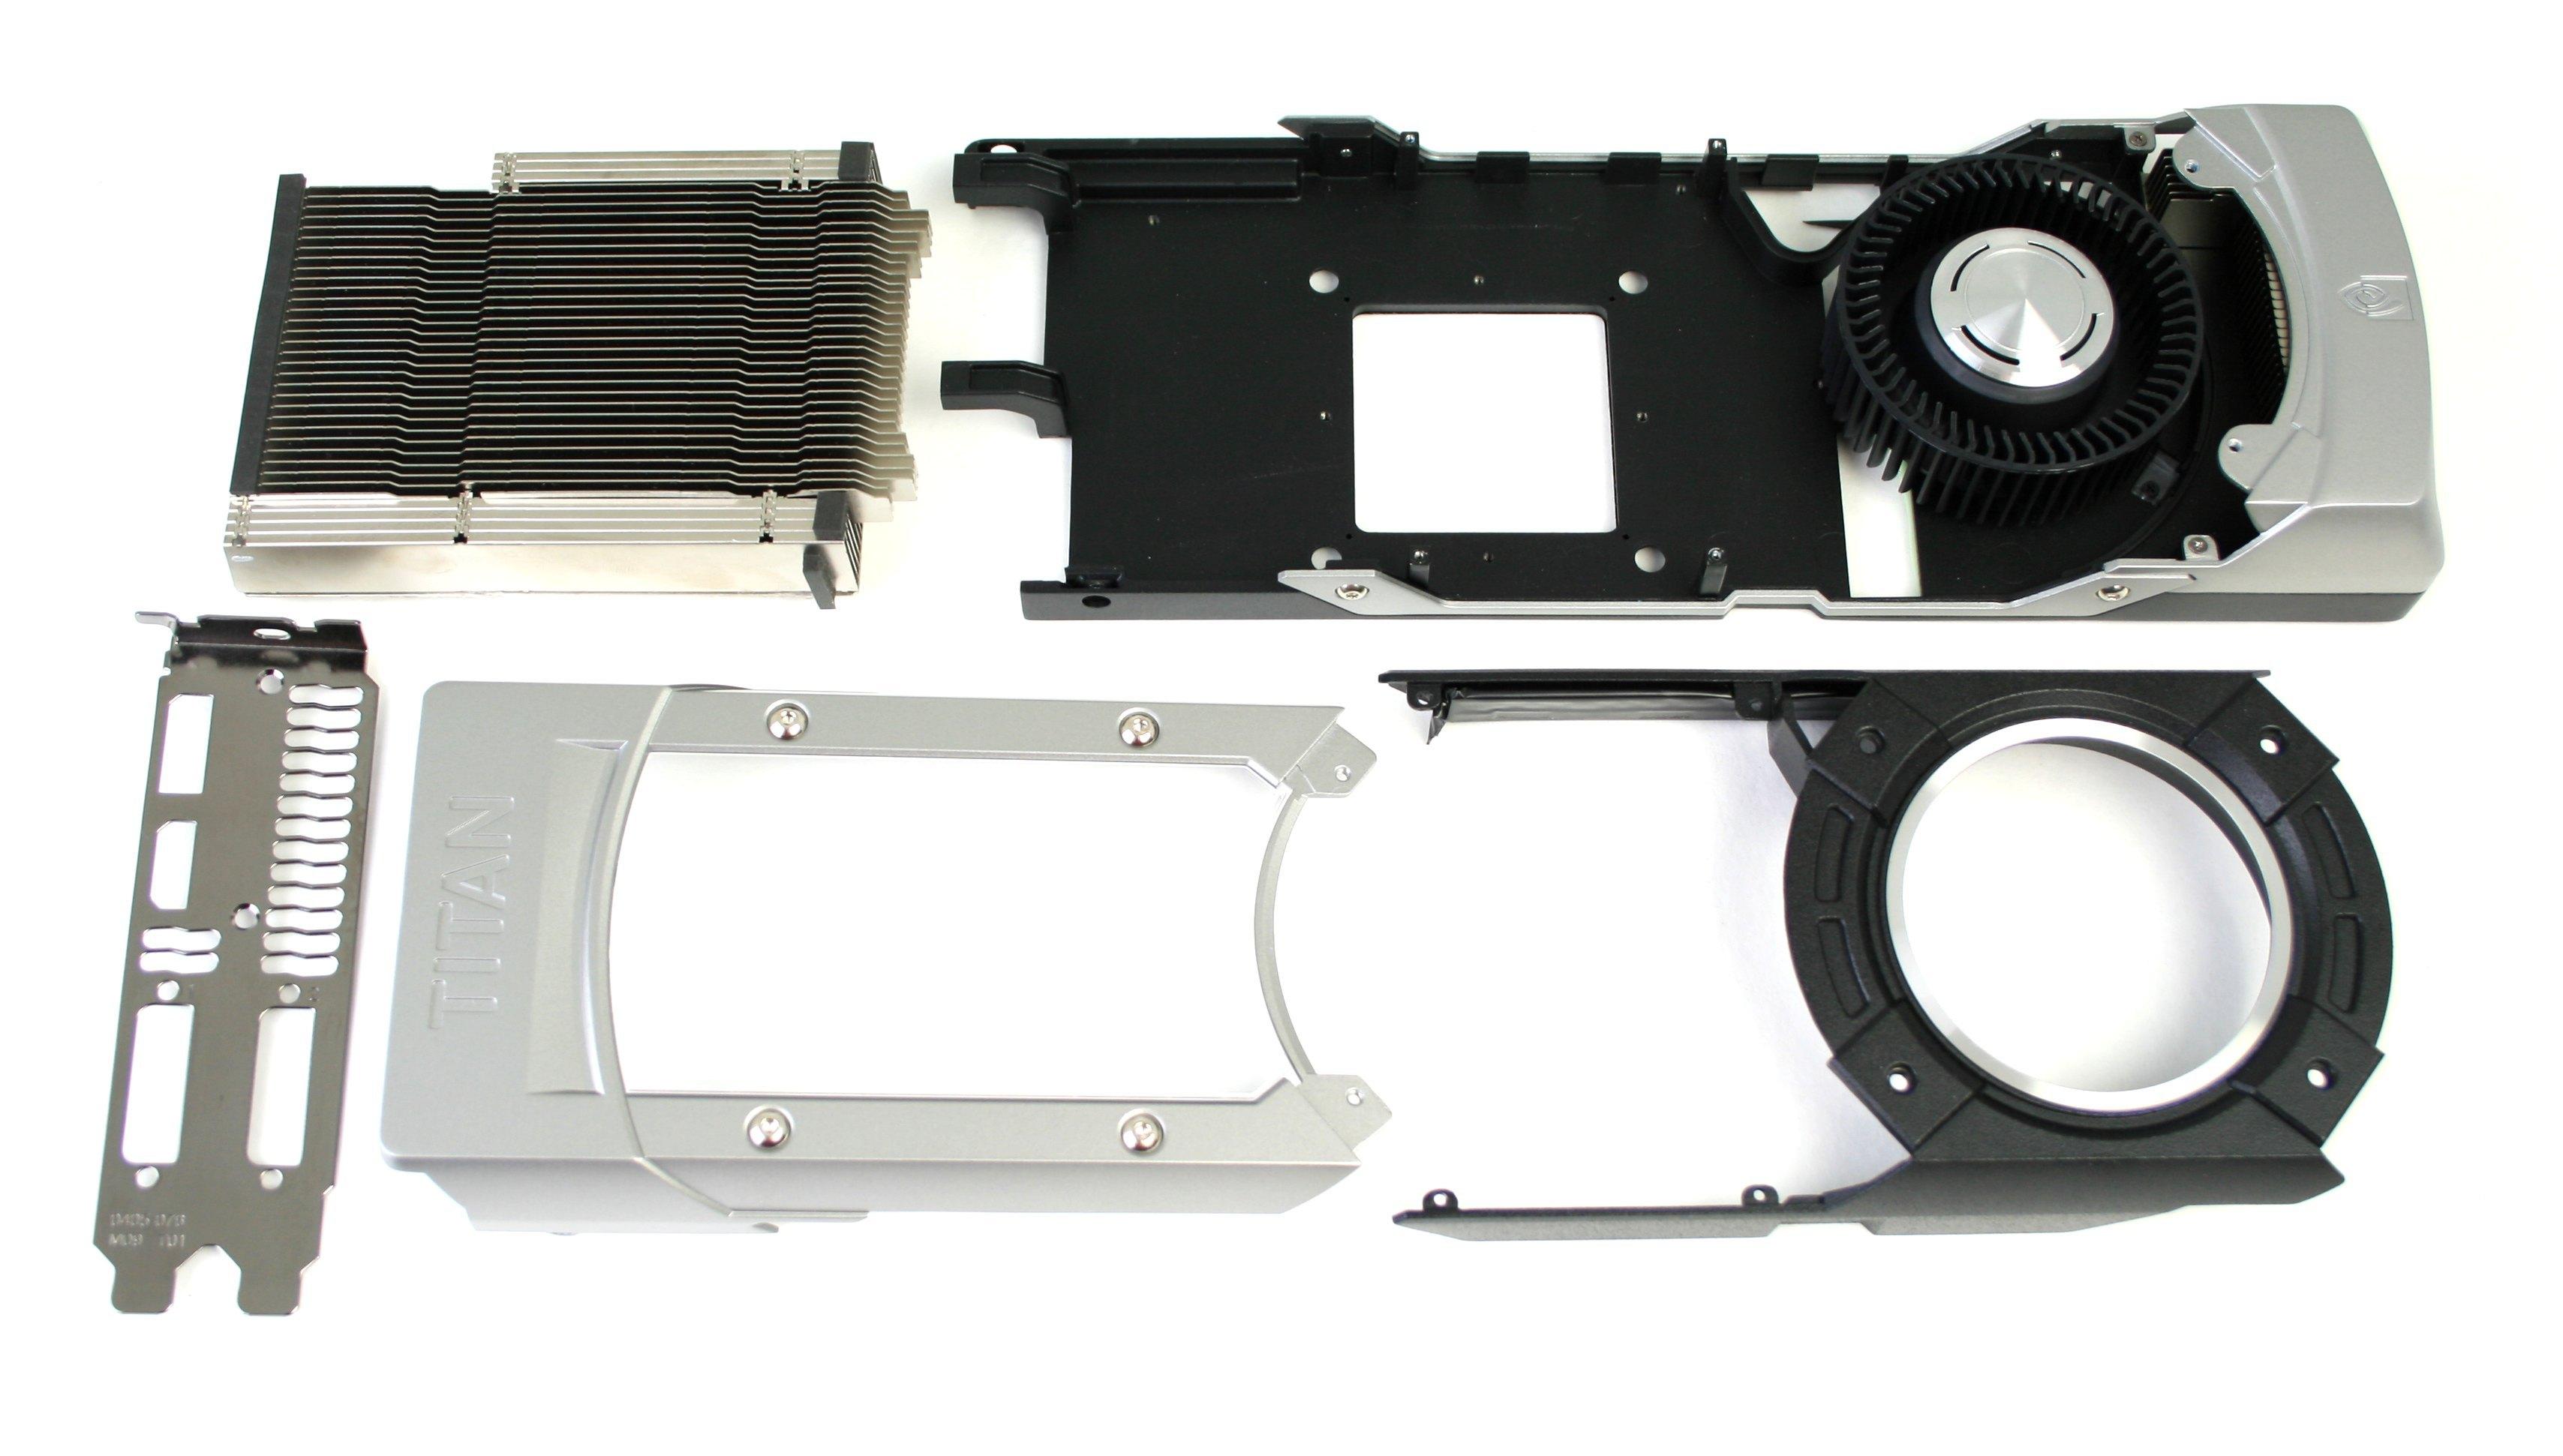 NVIDIA Geforce GTX Titan 6GB heatsink